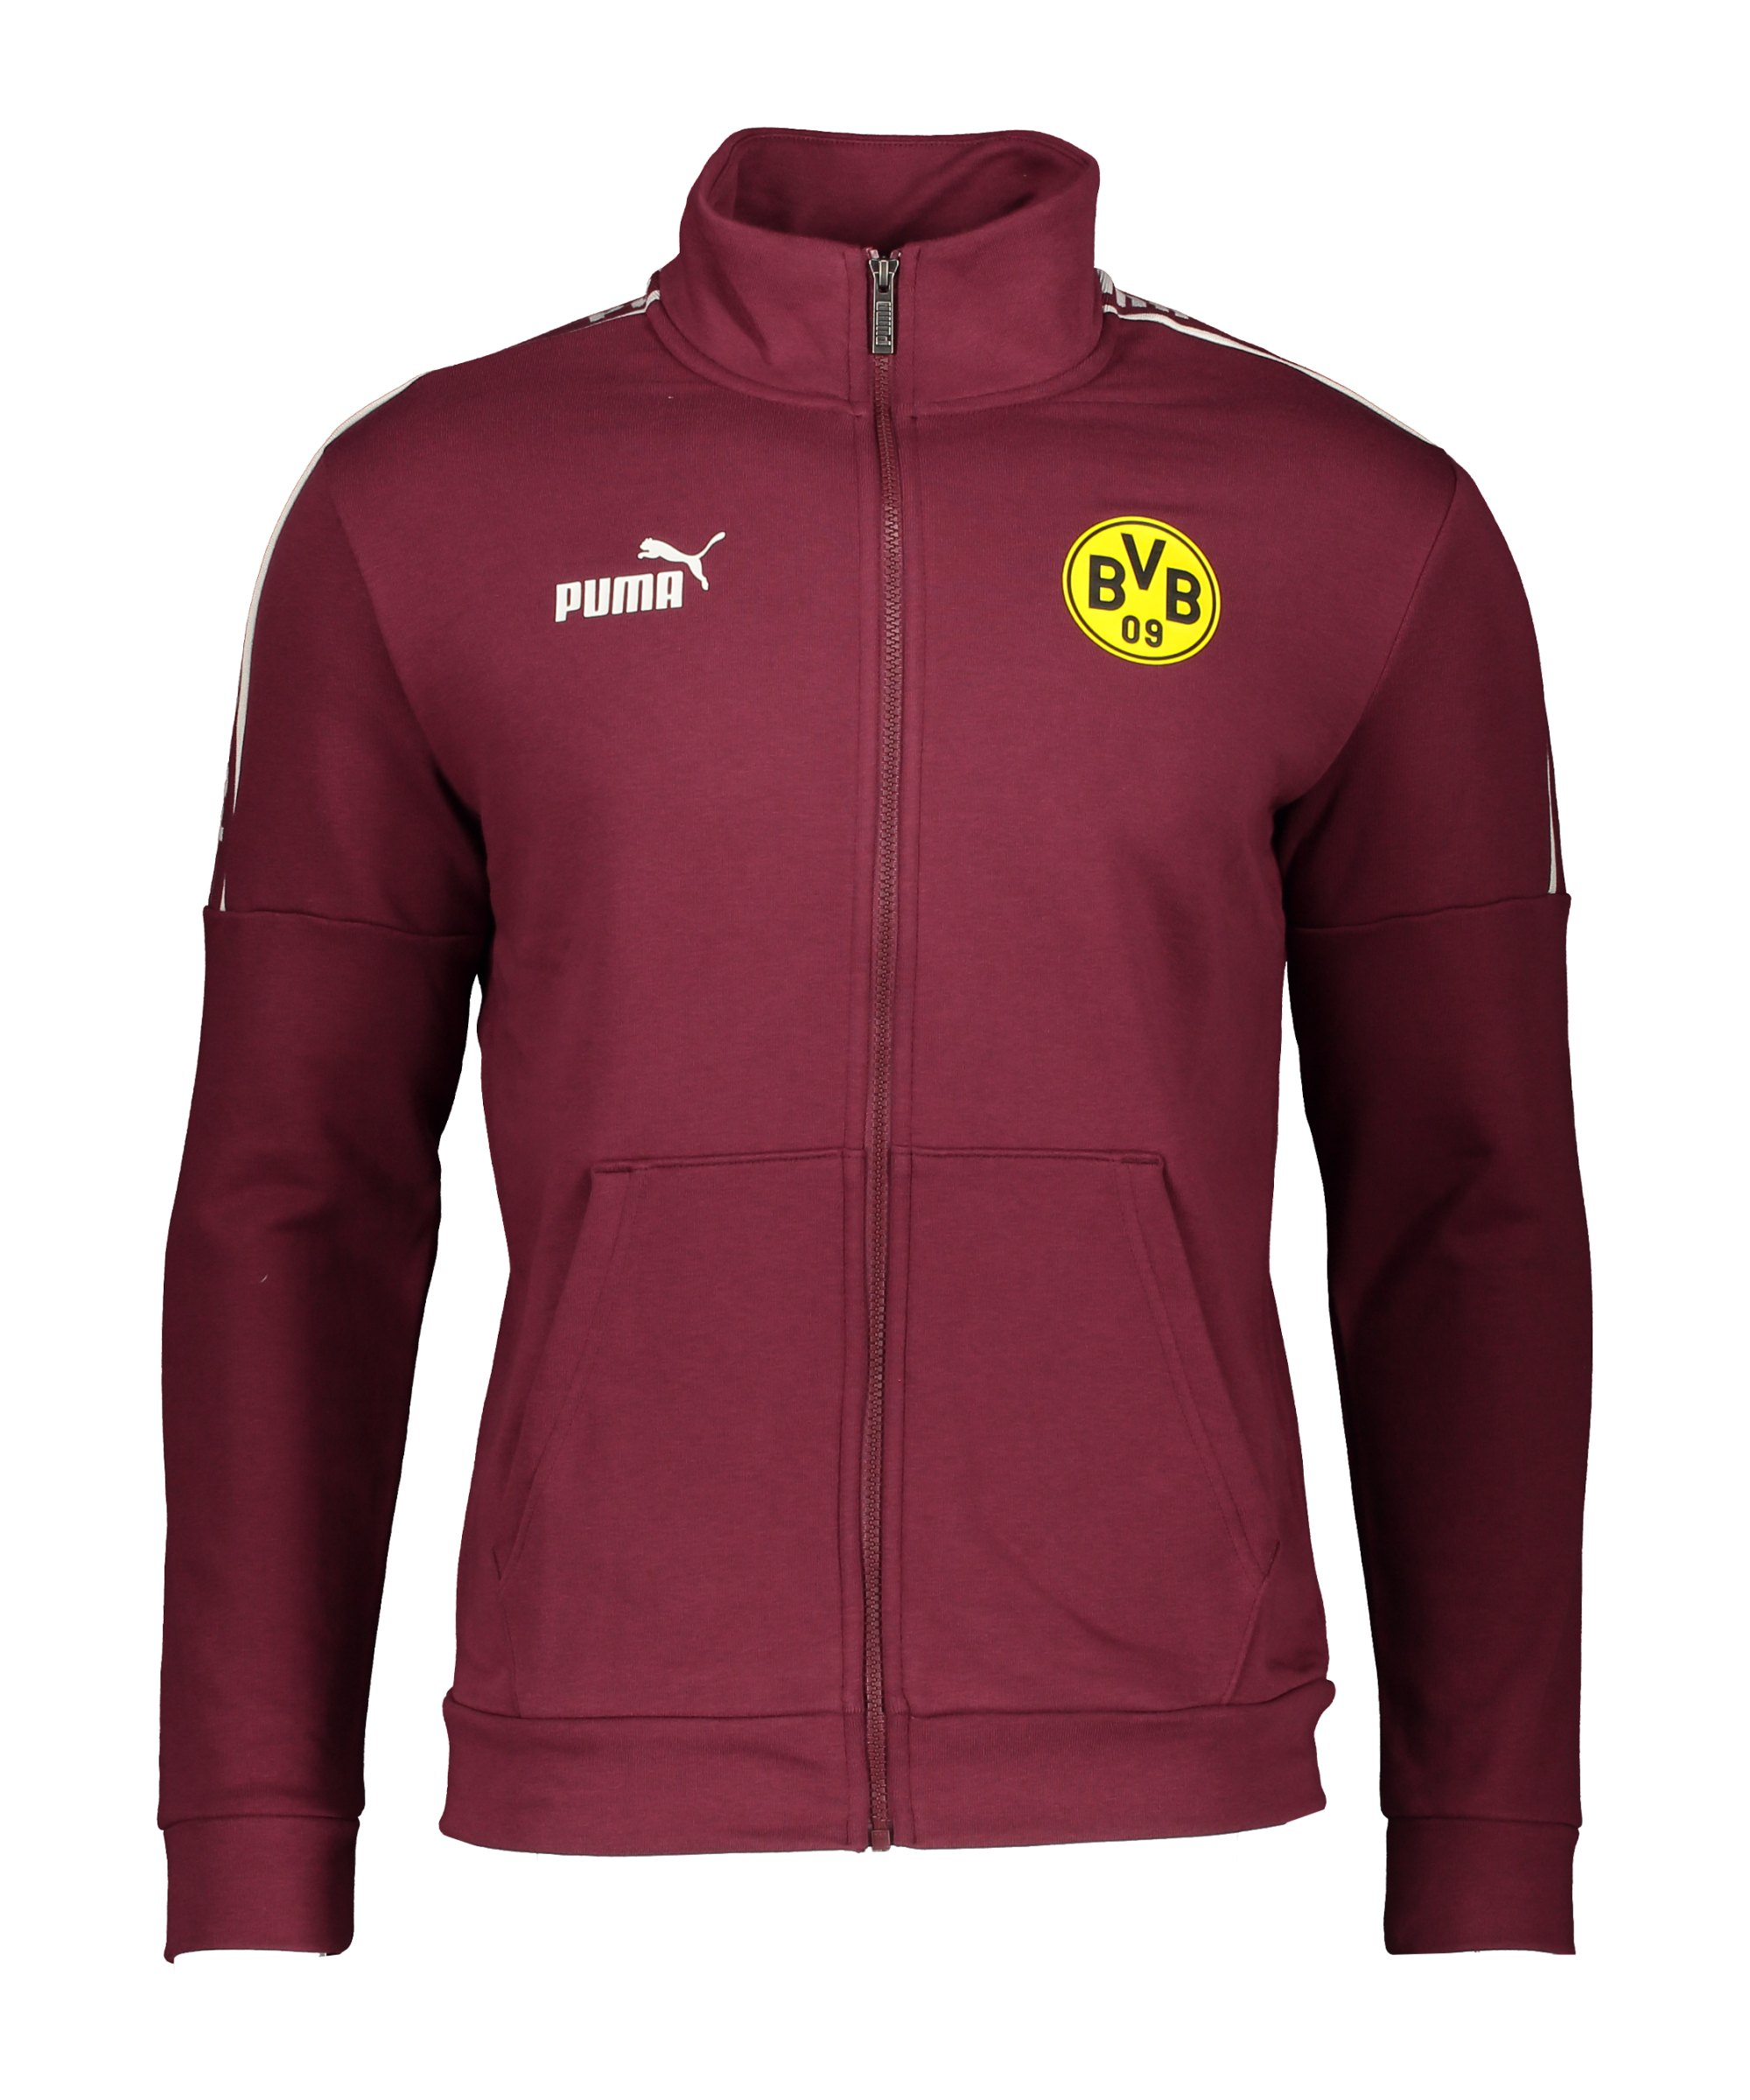 PUMA BVB Dortmund ftblCulture Track Jacke F08 - rot